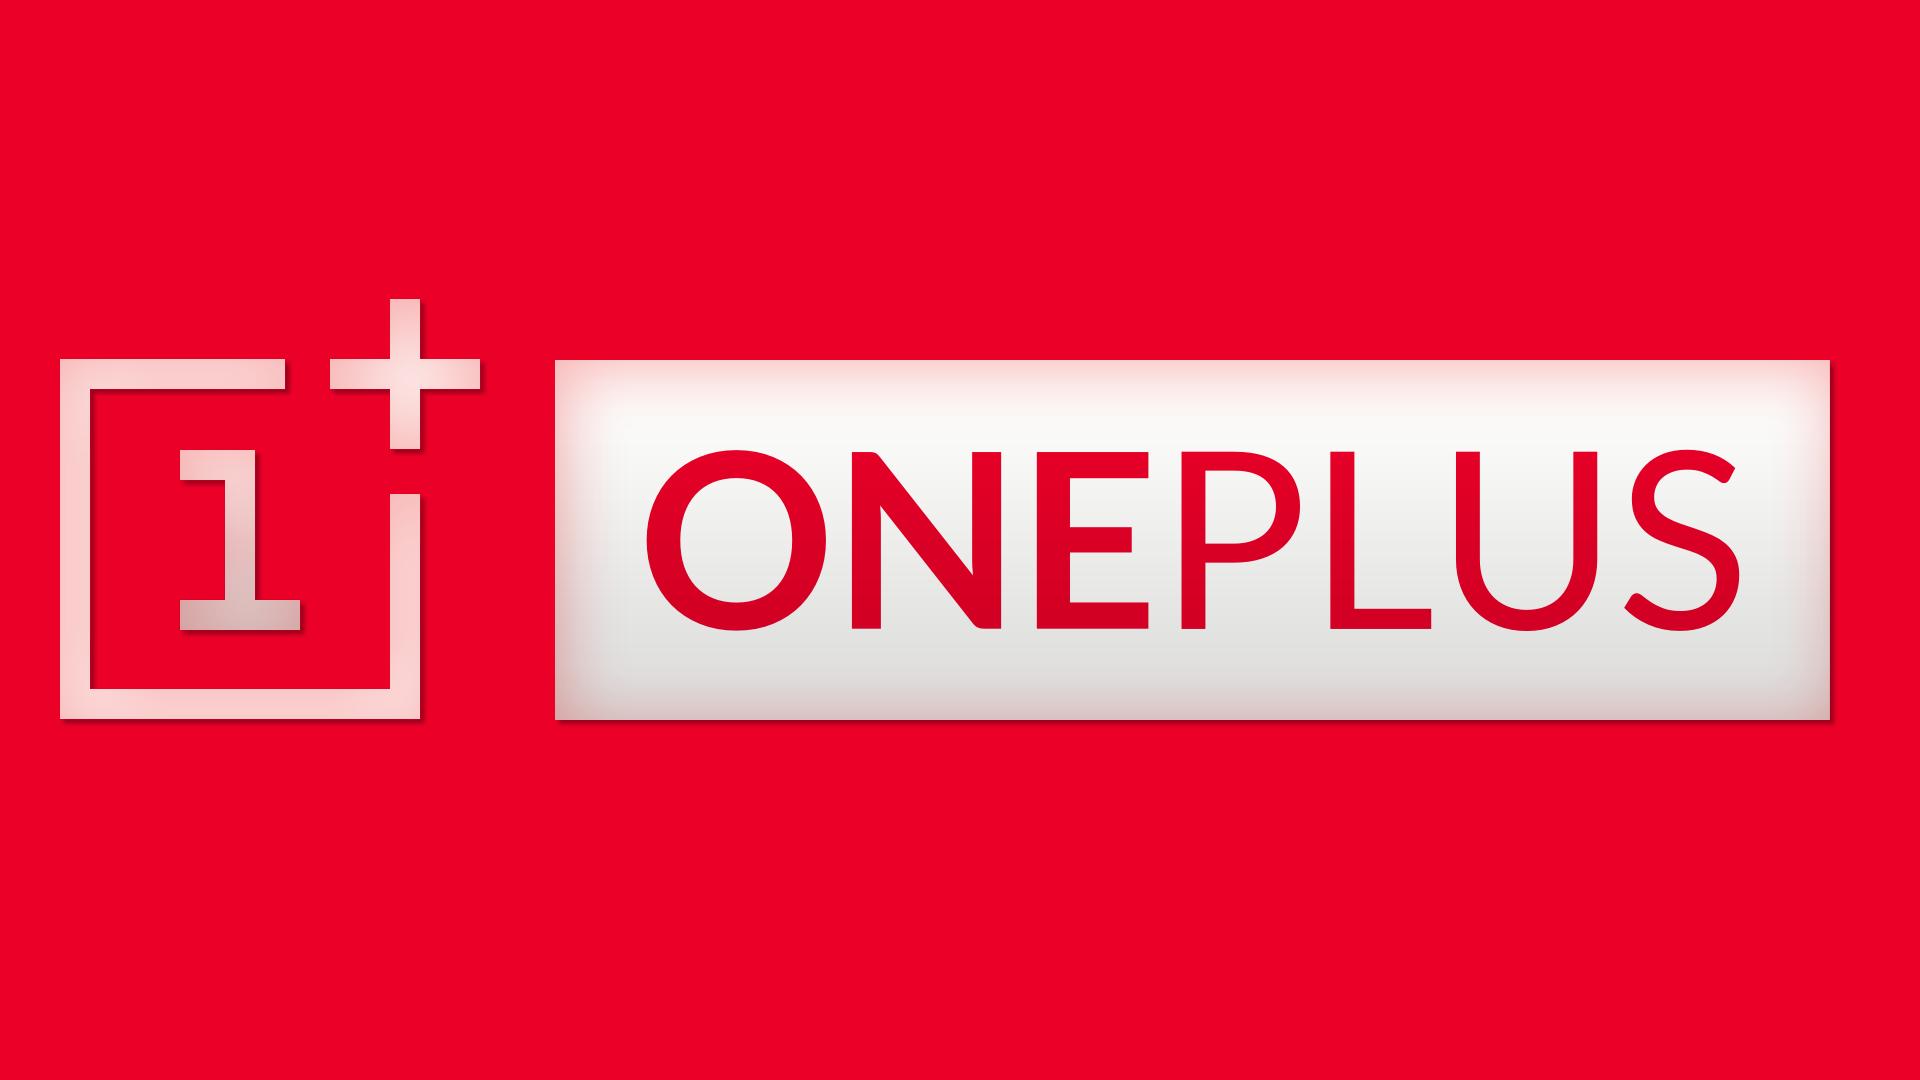 EE e OnePlus insieme per il primo telefono 5G in Europa thumbnail